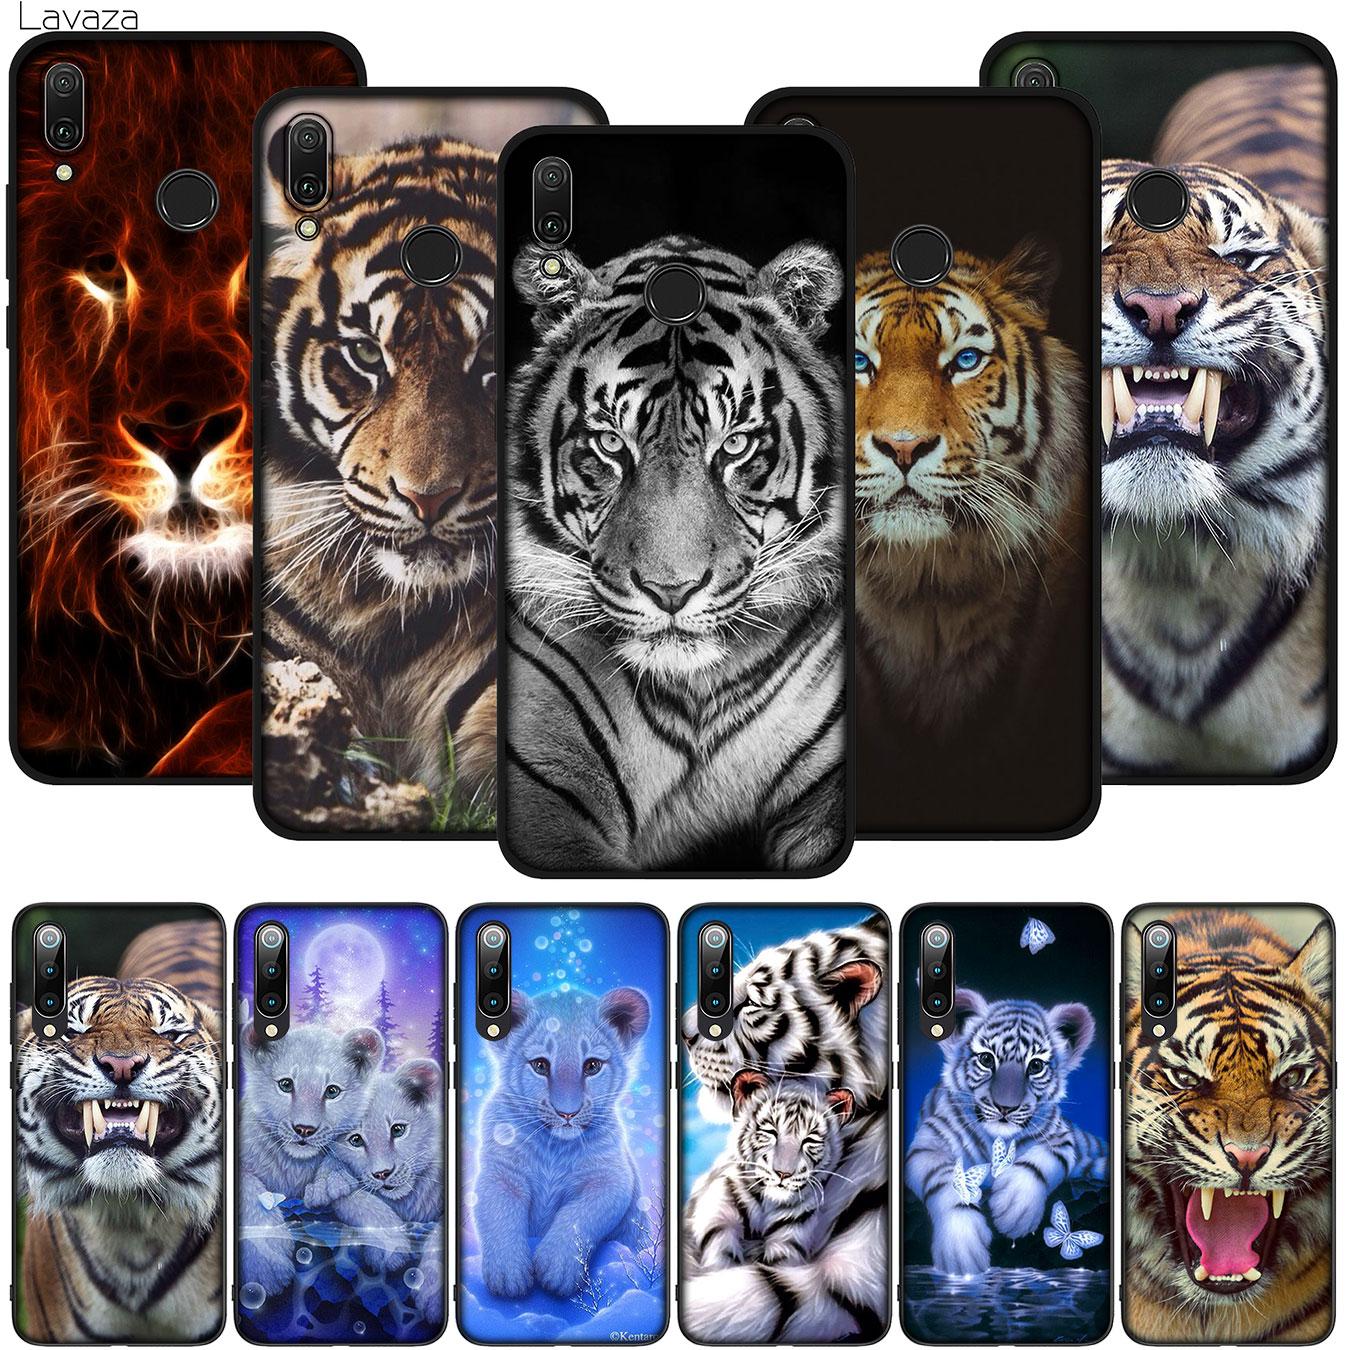 Animal cachorro de tigre cubierta suave de silicona para Xiaomi Redmi Nota 8 7 6 5 Pro 8T 7A 6A 5A primer Plus teléfono caso